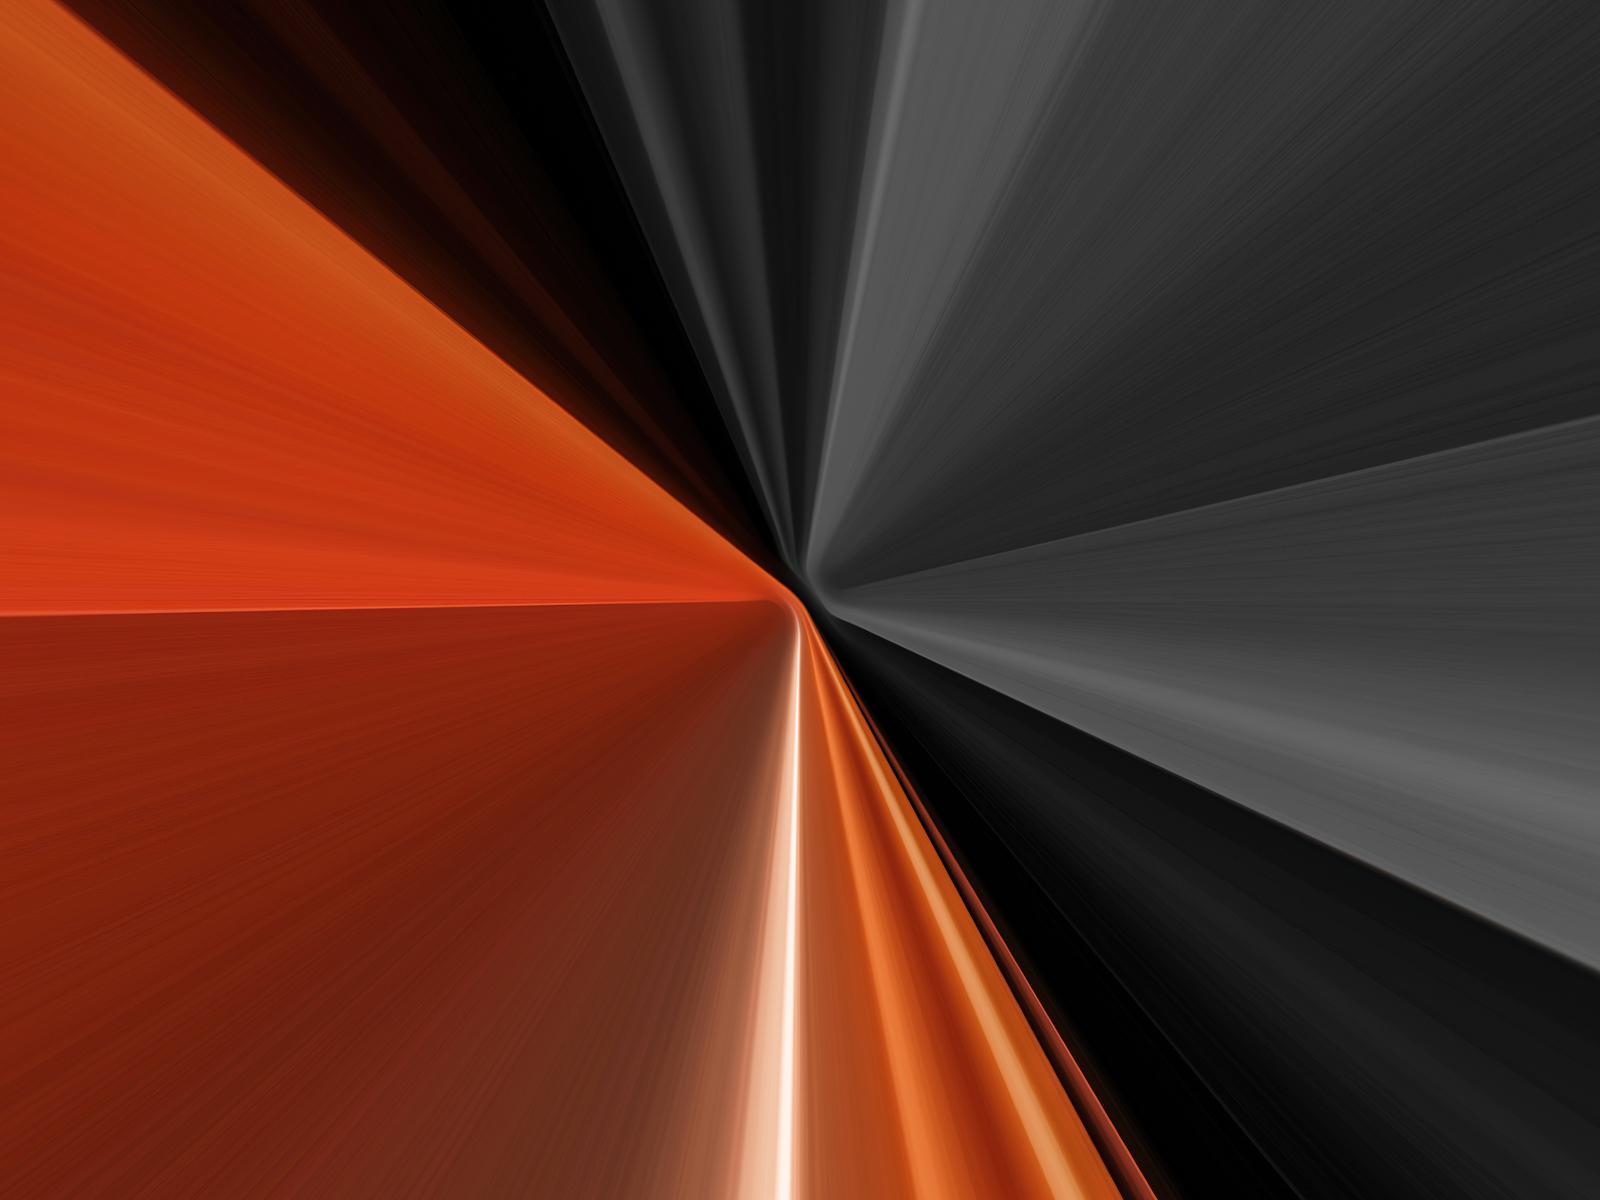 sharp-lines-grey-orange-4k-zr.jpg